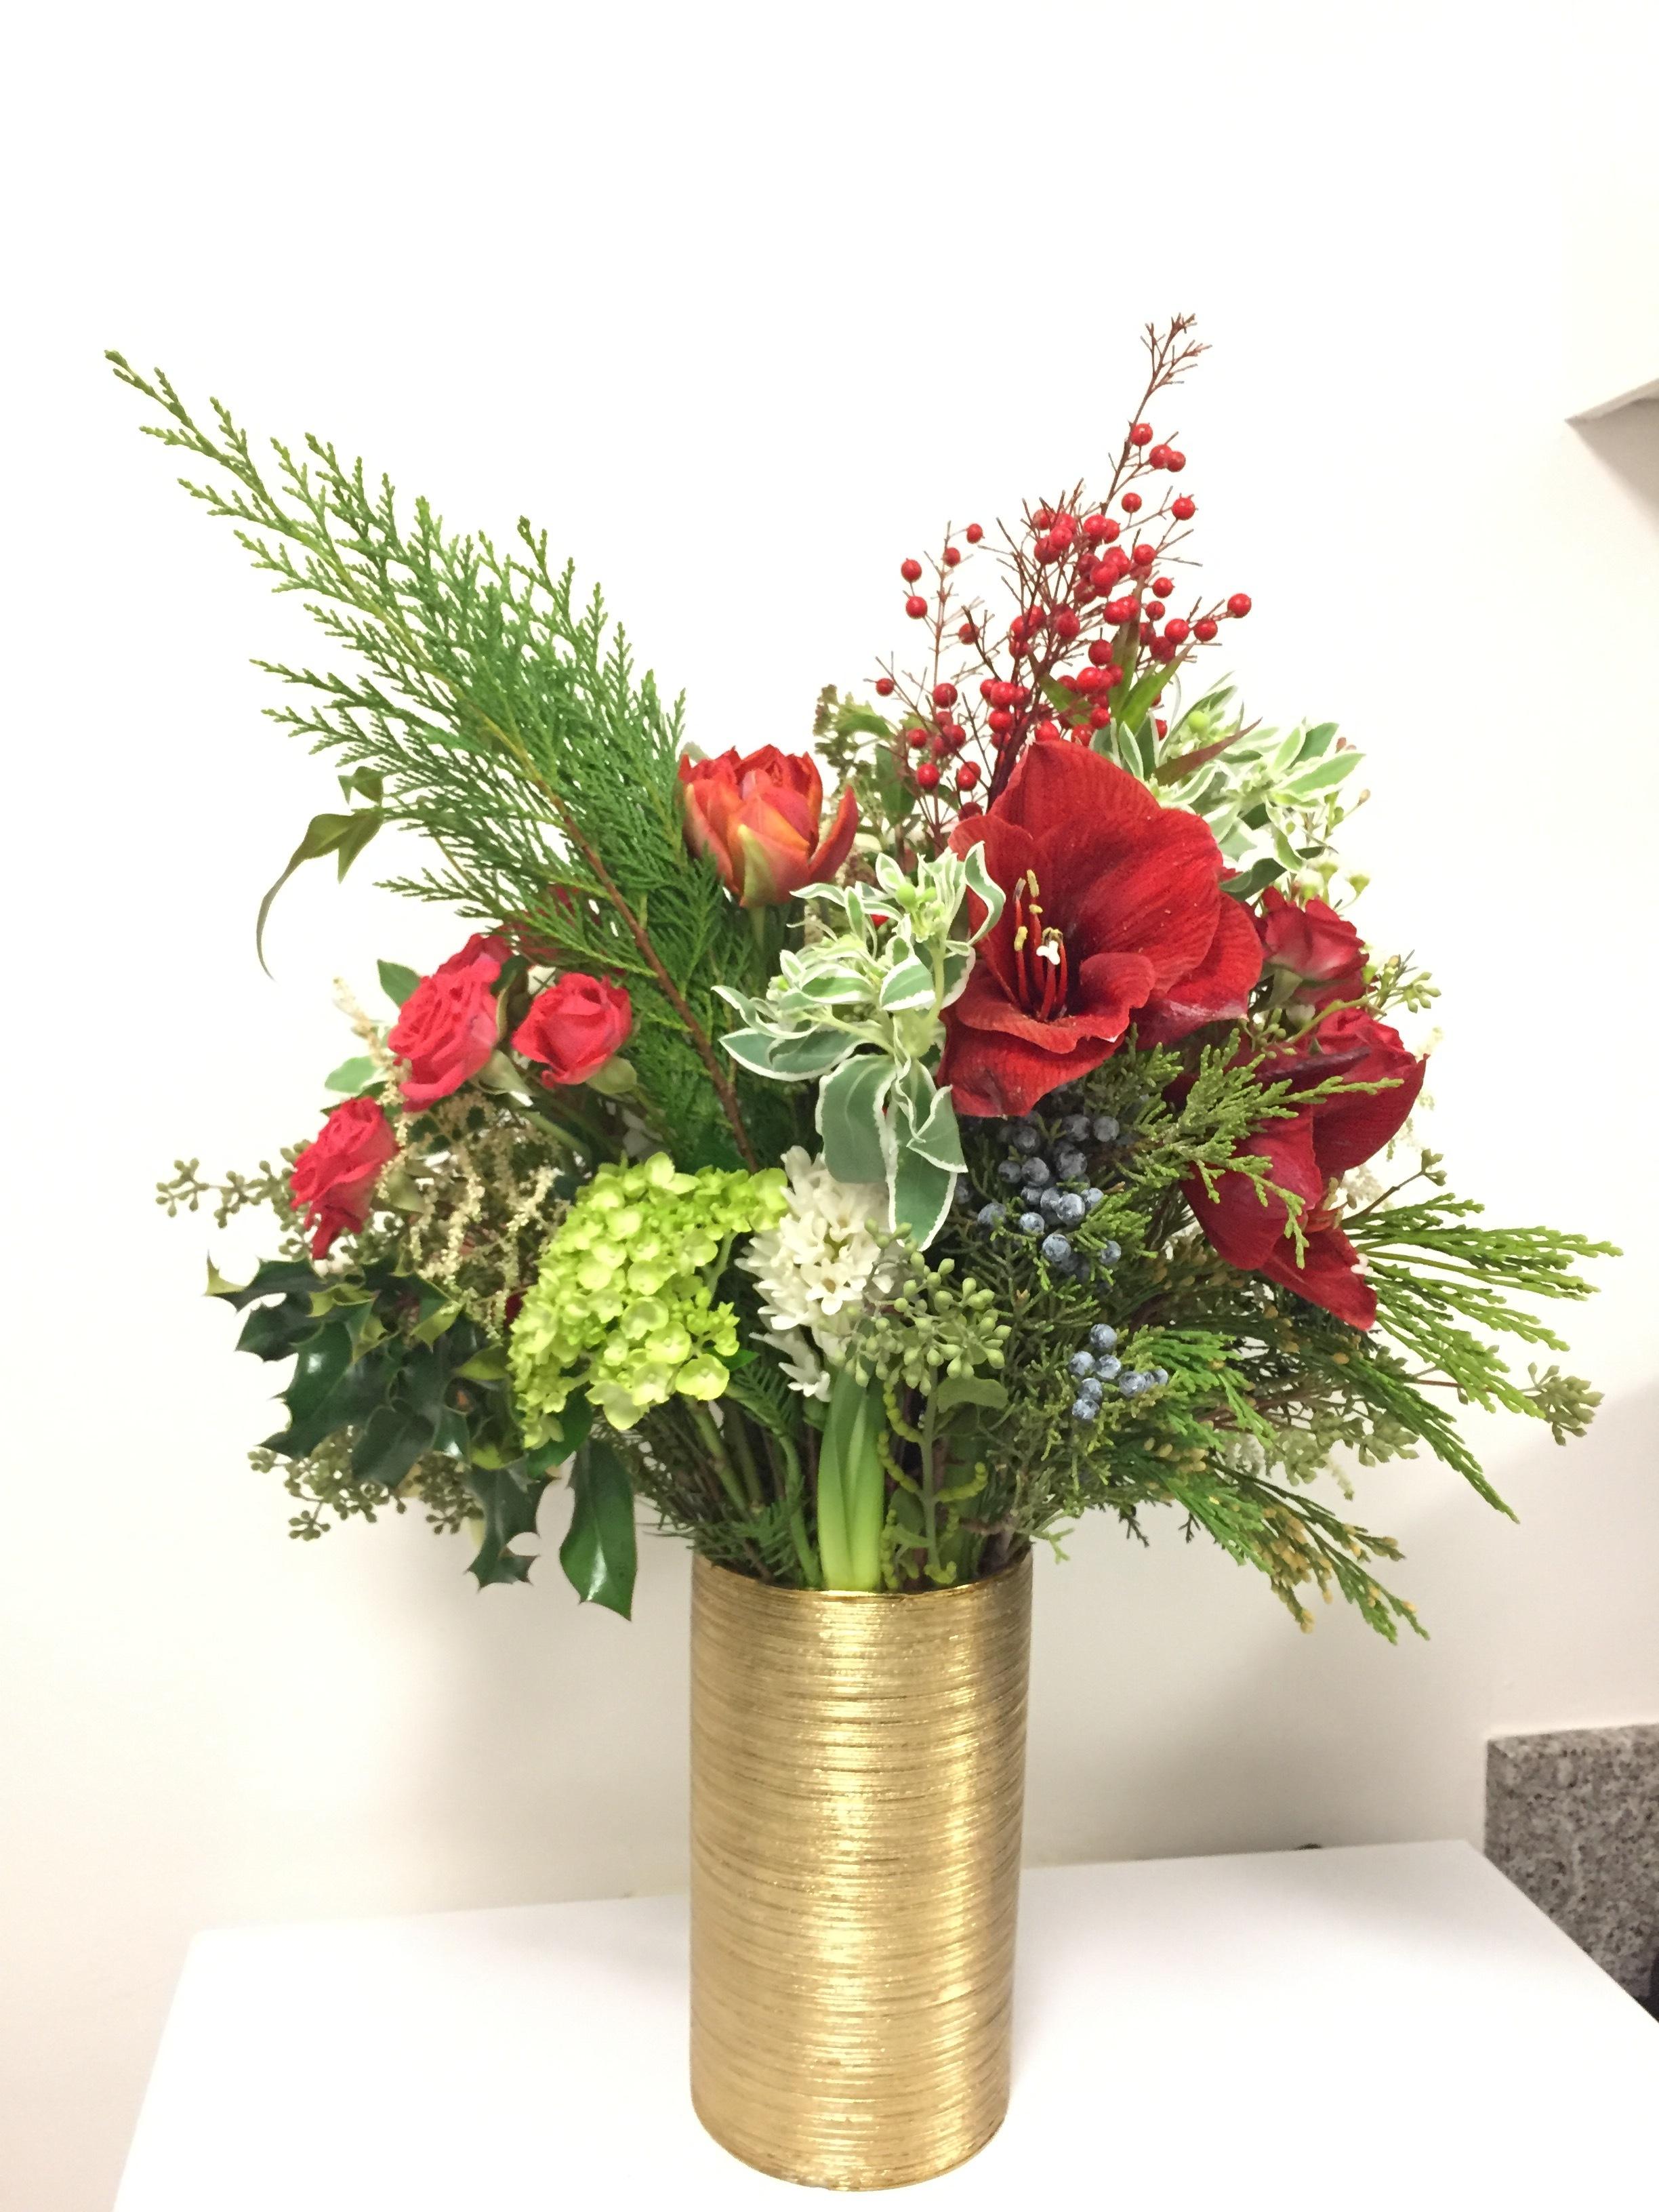 Domonique Rose Floral Design - Holiday3